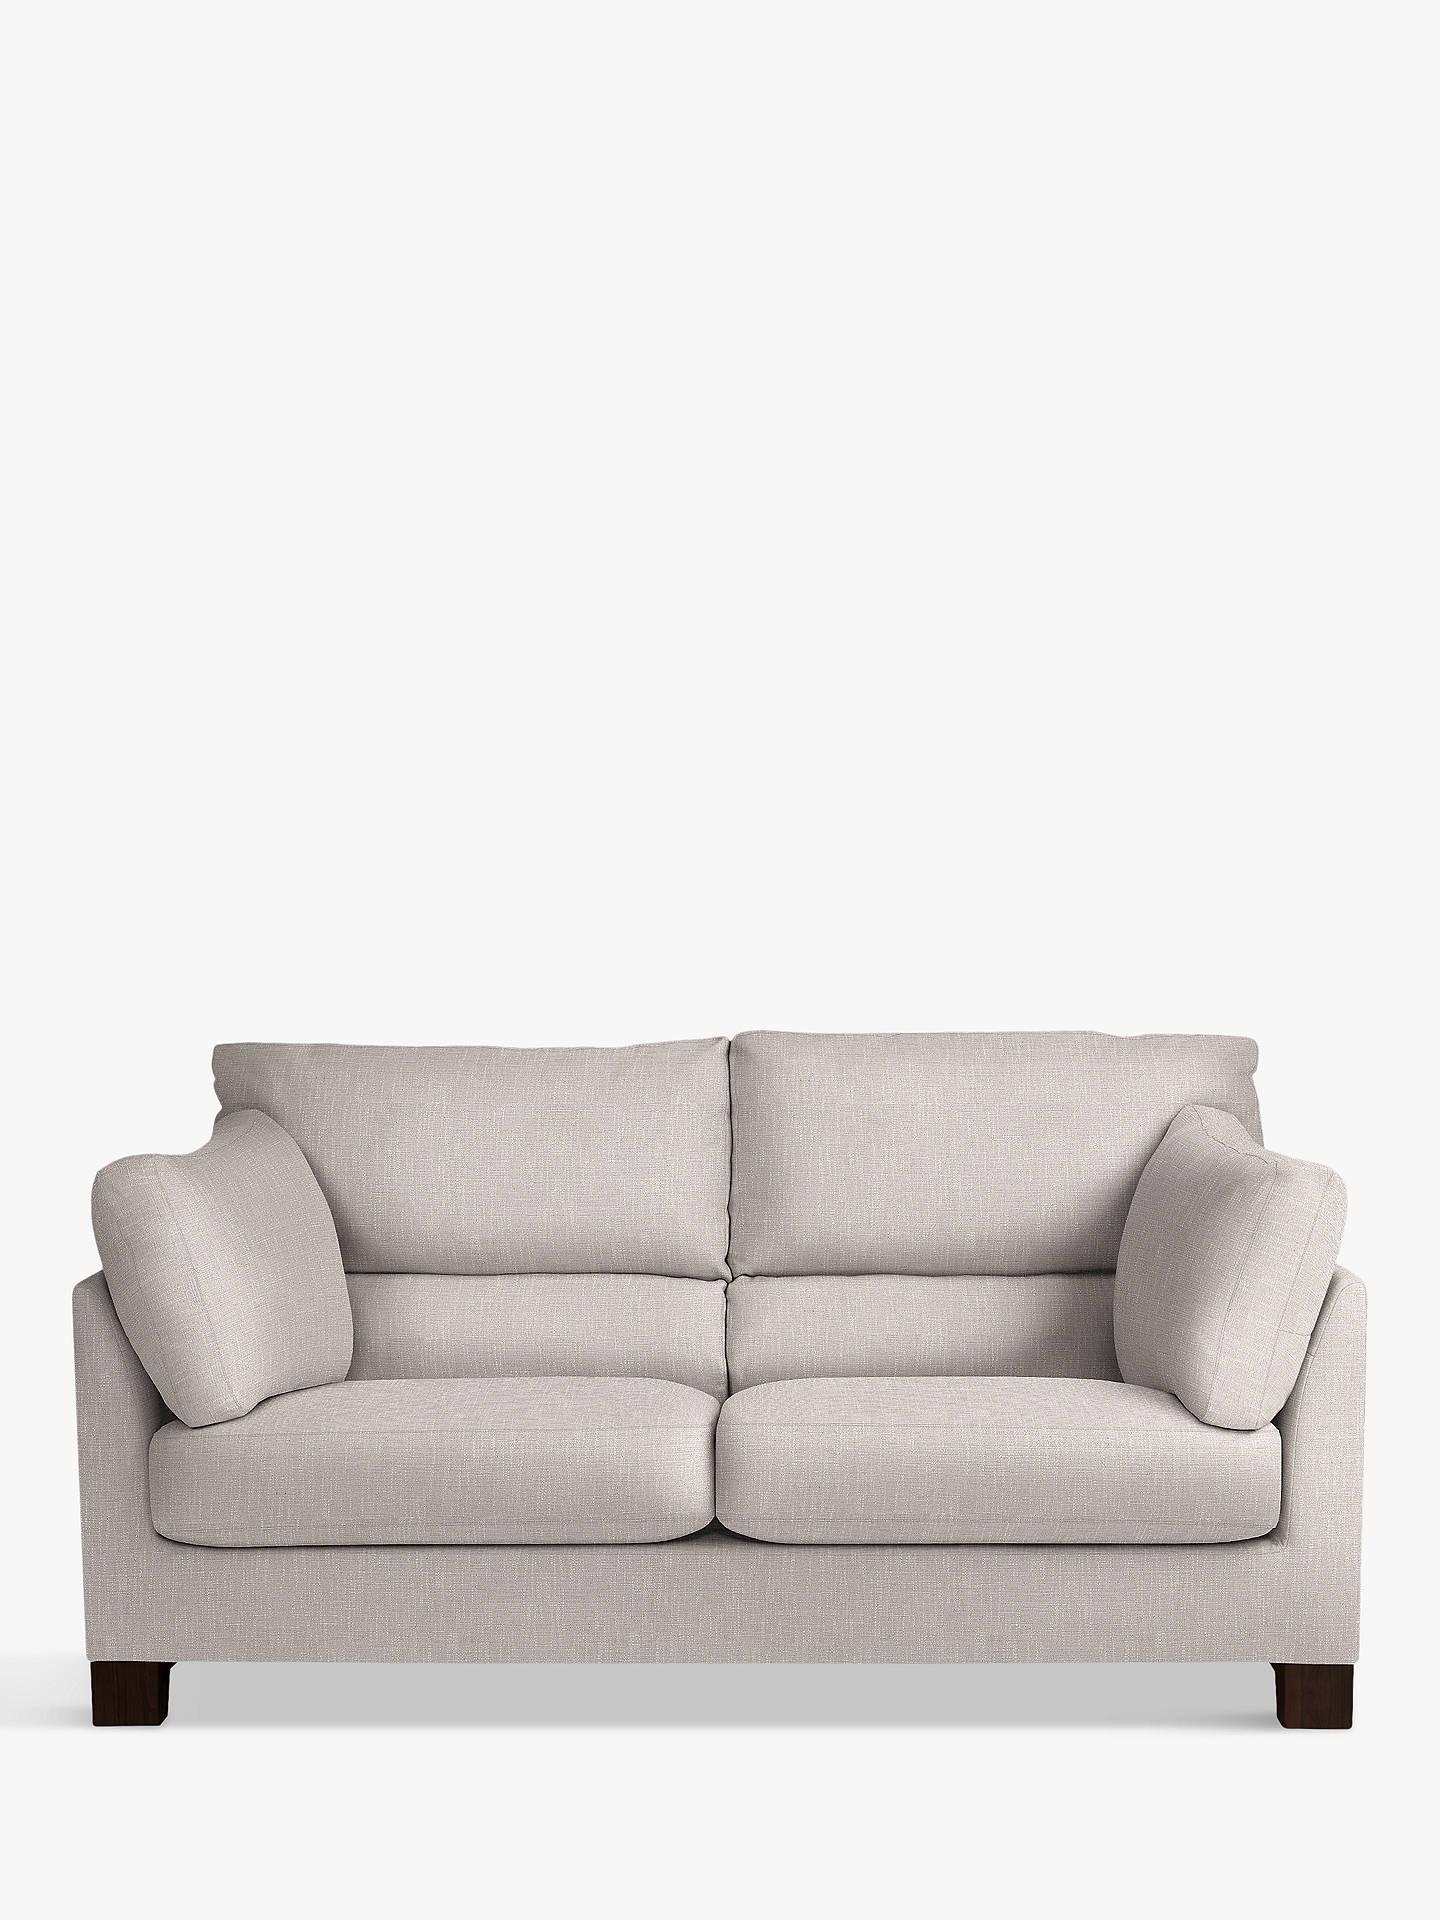 John Lewis & Partners Ikon High Back Medium 2 Seater Sofa, Henley French  Grey